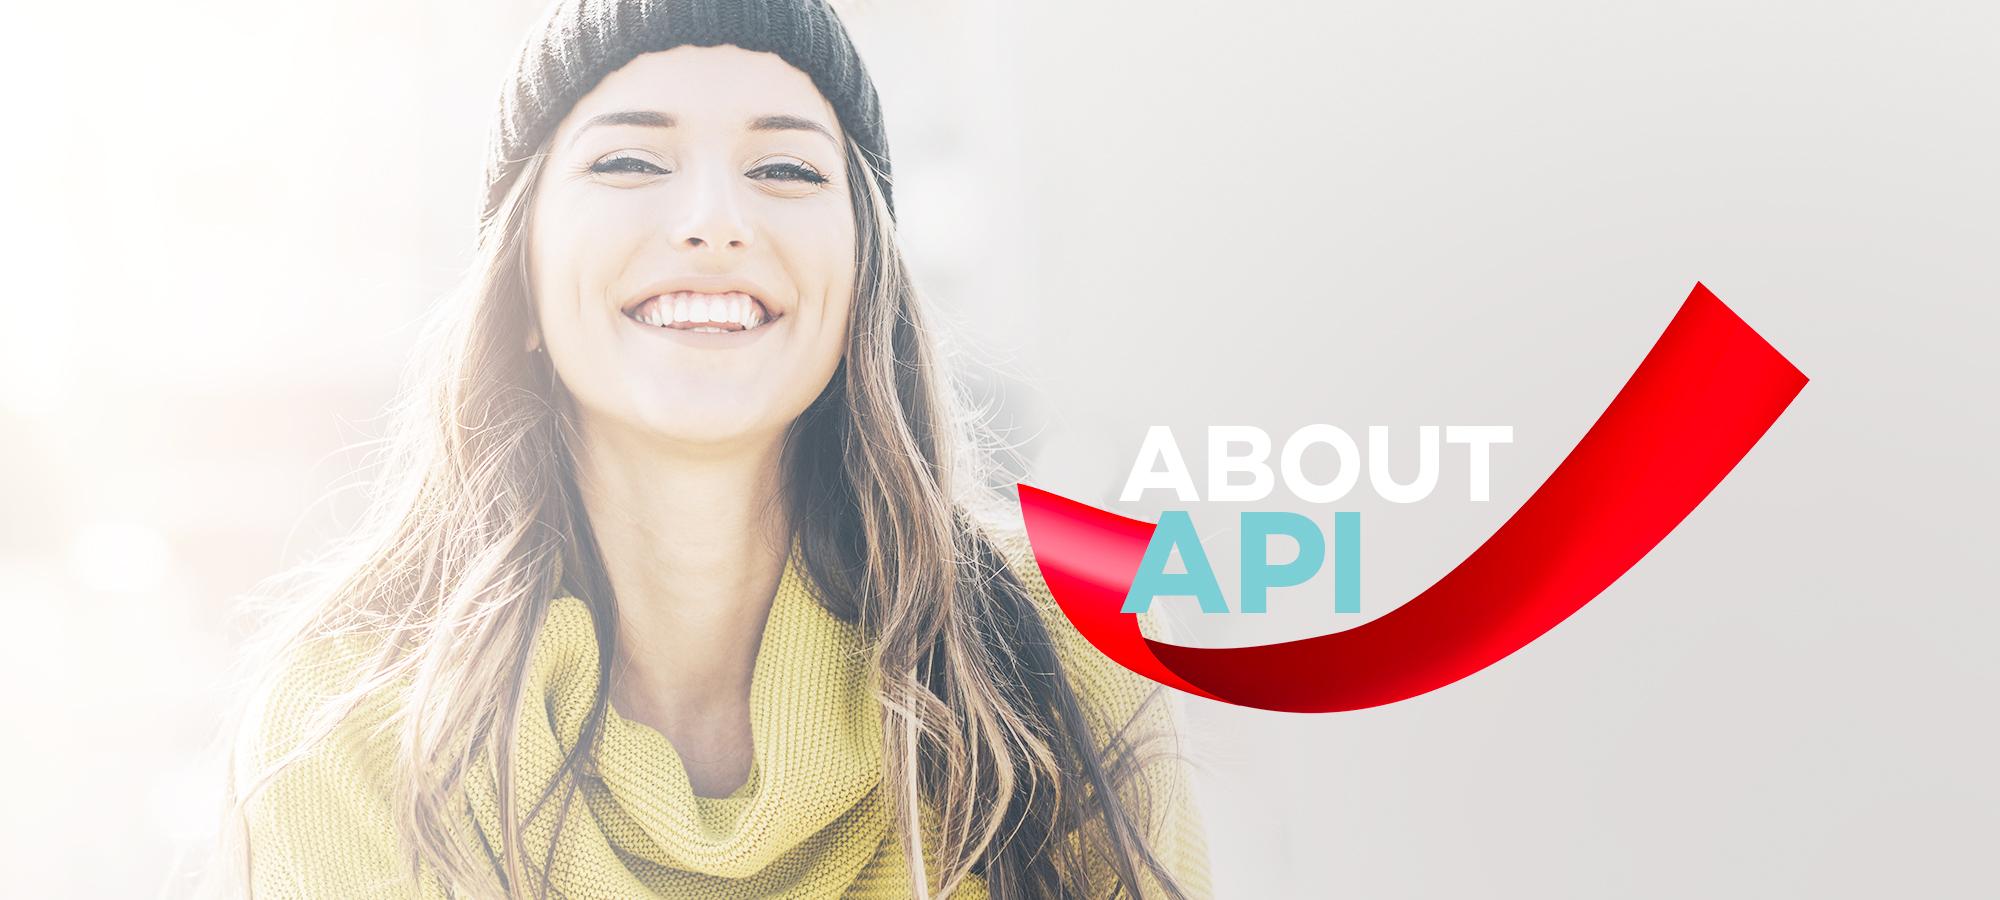 About API